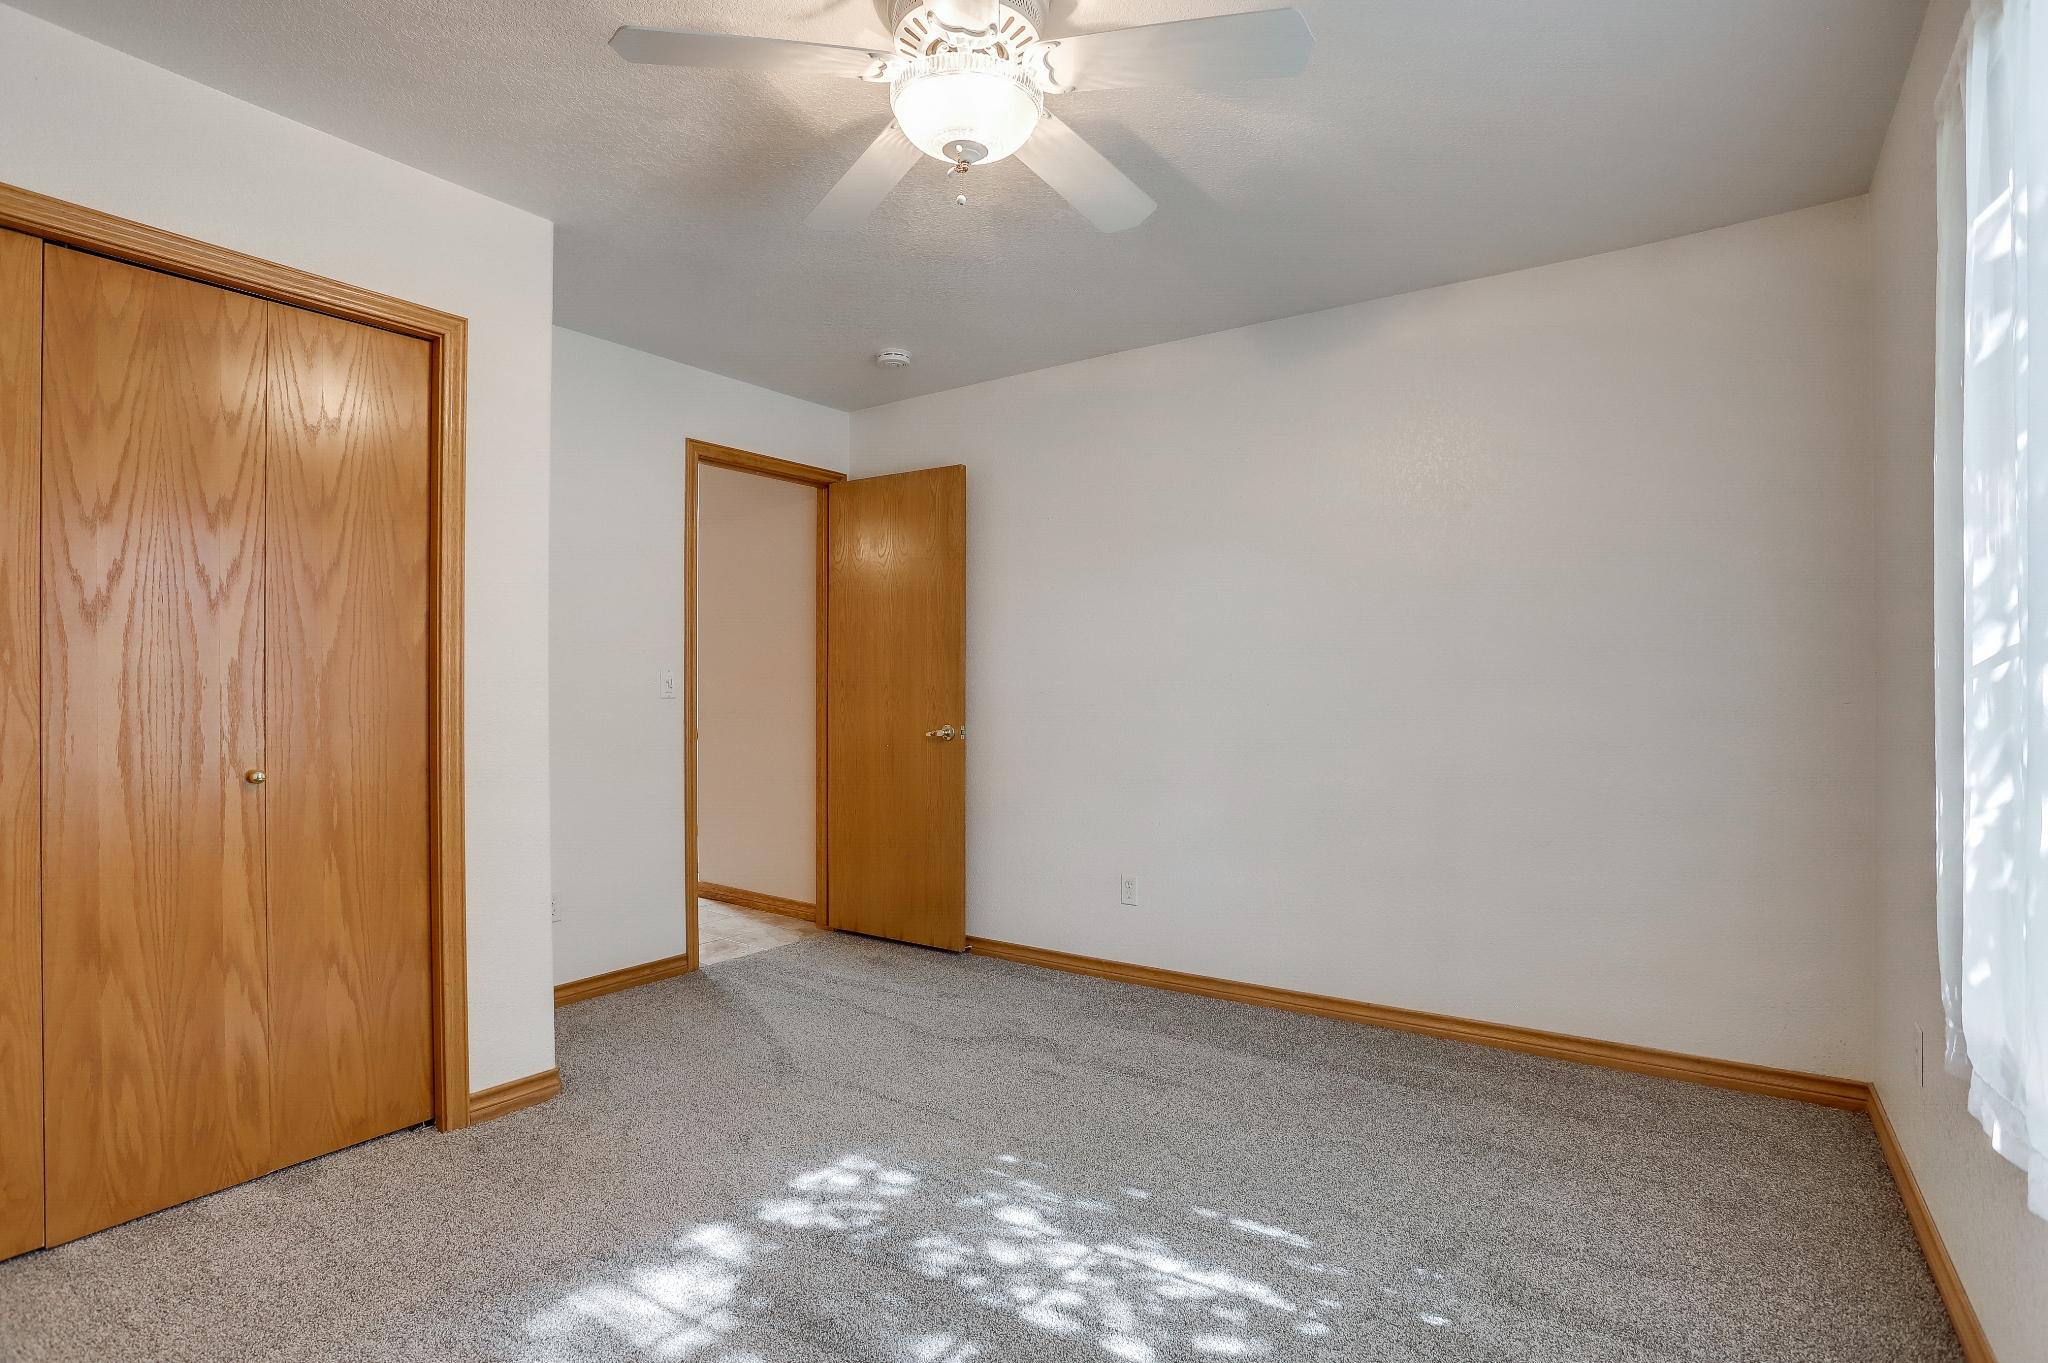 REAL ESTATE LISTING: 1730 Grove Ct Longmont Bedroom 2